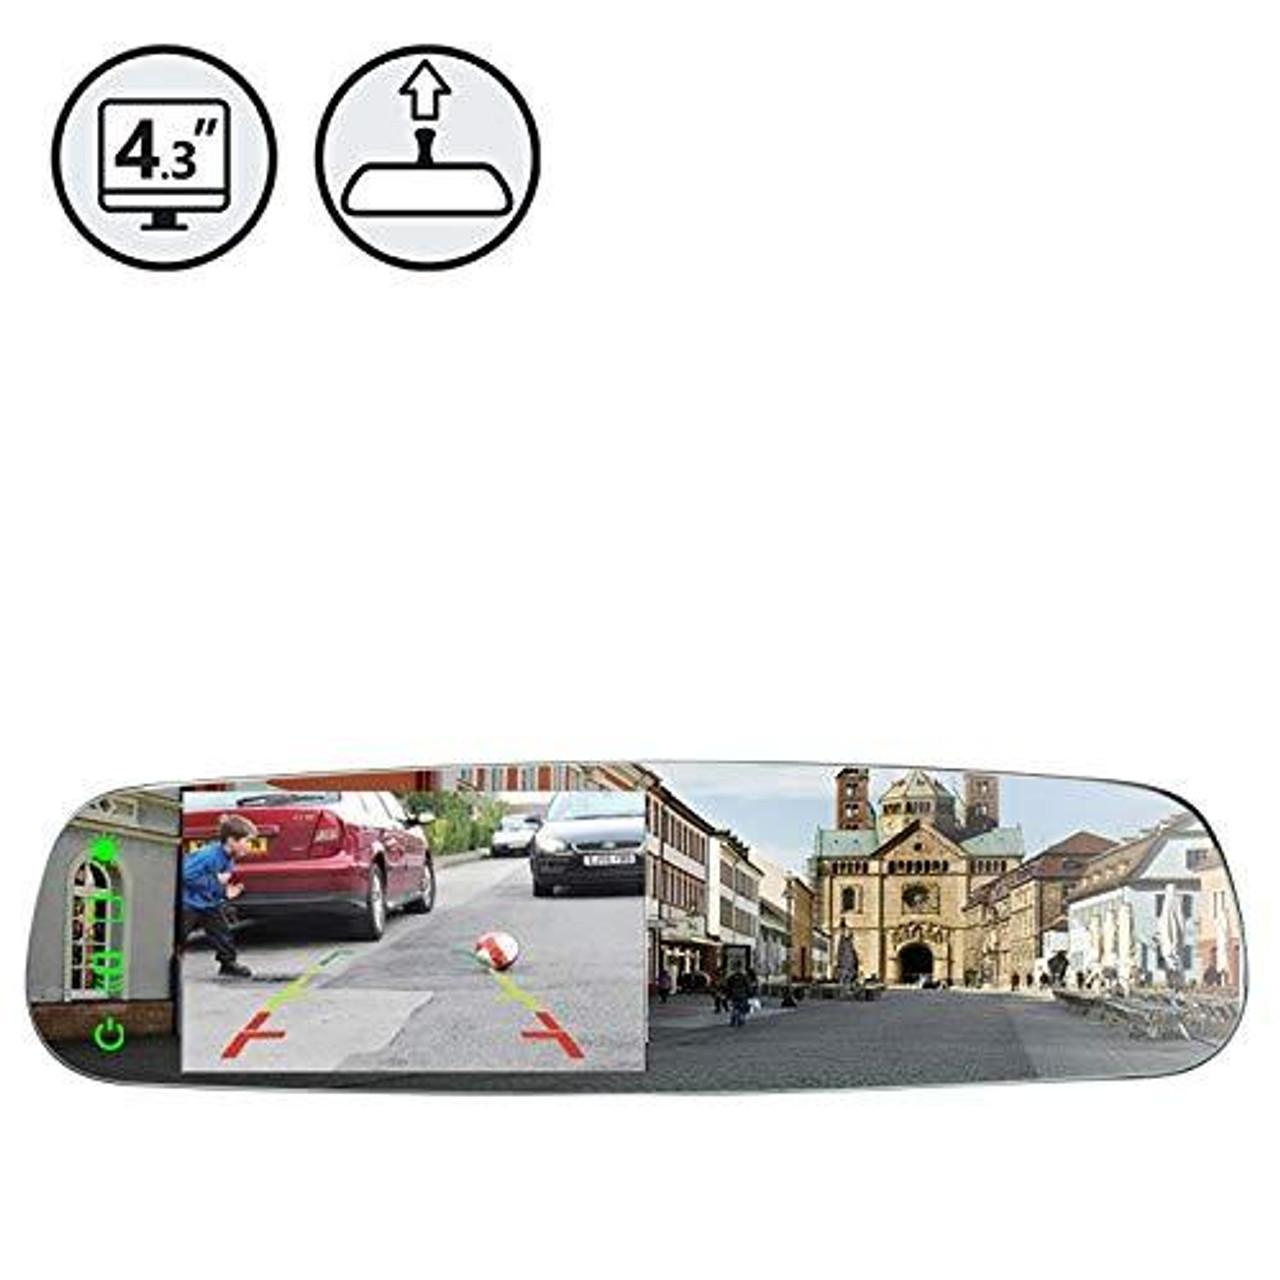 G-Series Rear View Frameless Mirror Monitor